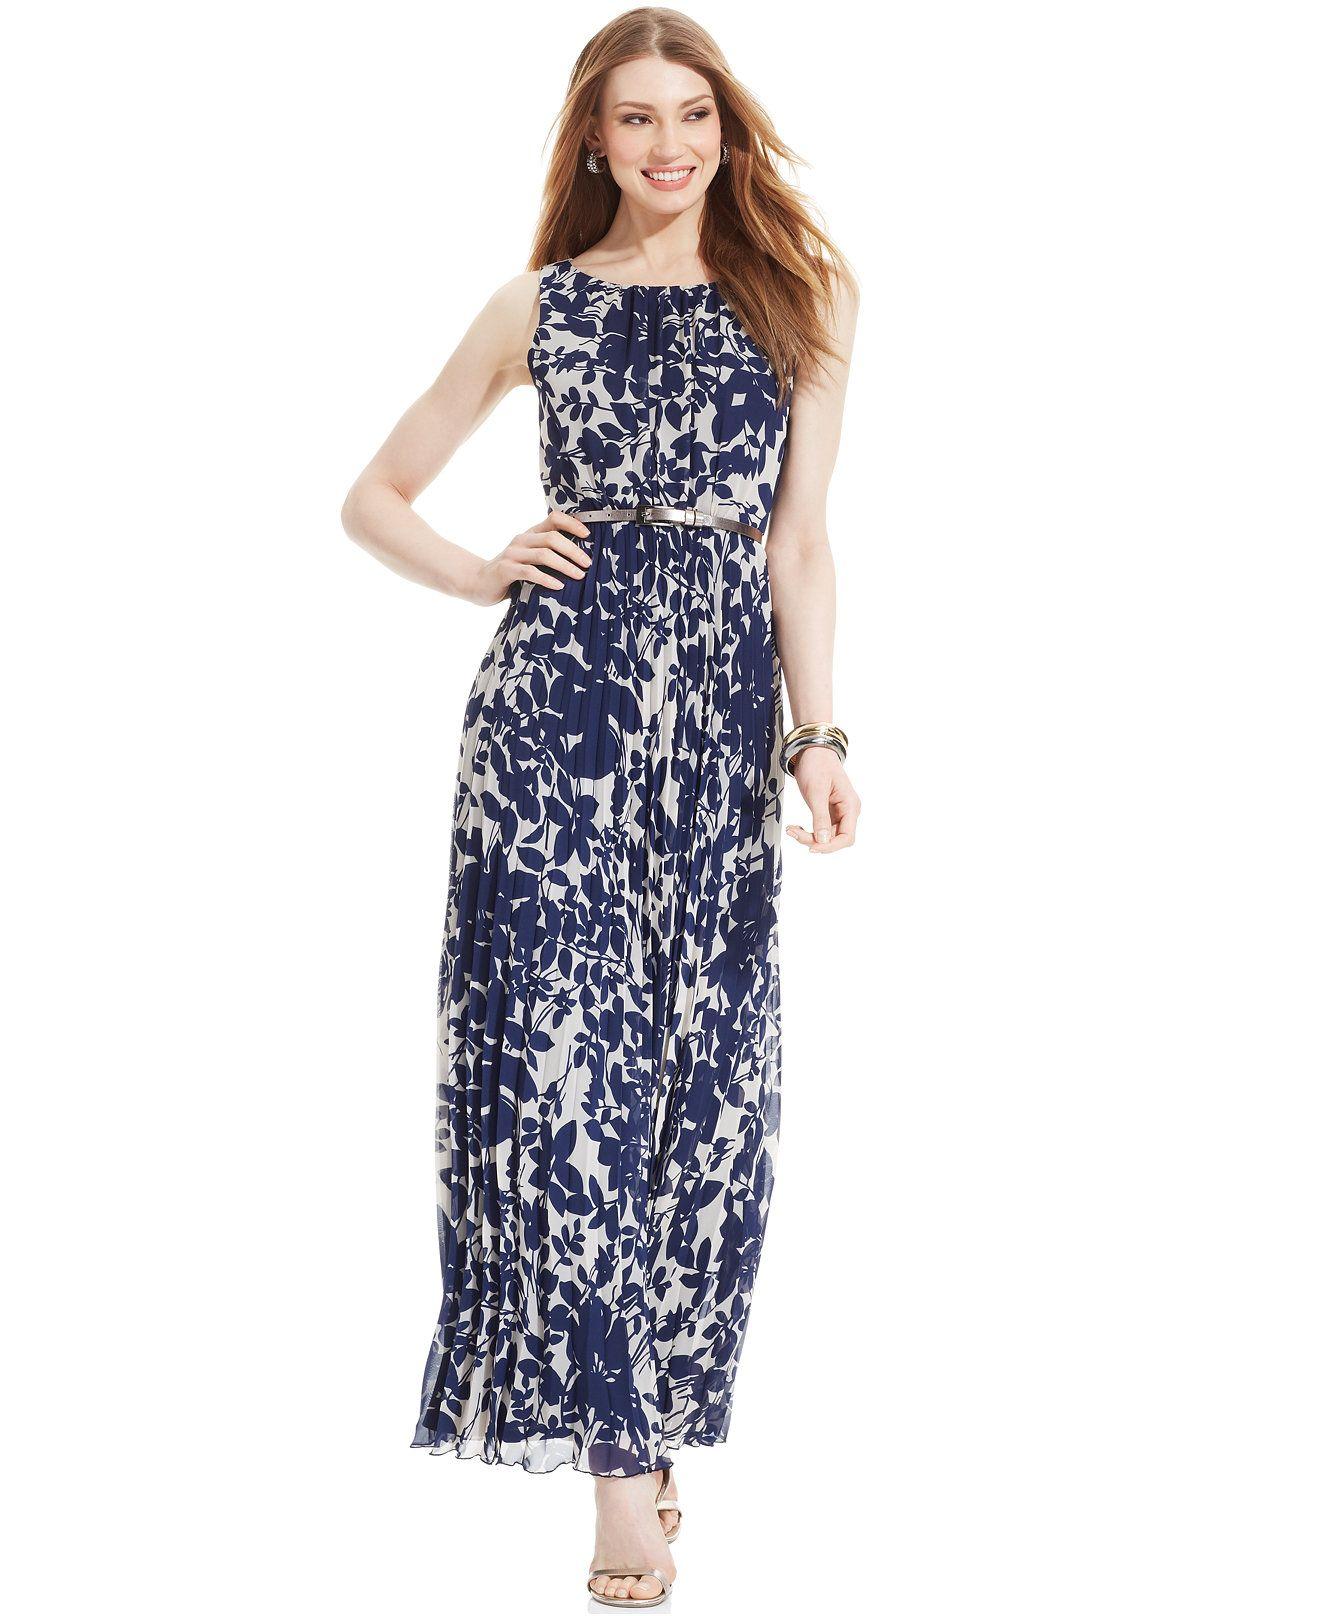 5b4b97ca357e Jessica Howard Petite Floral-Print Pleated Maxi Dress - Dresses - Women -  Macy's